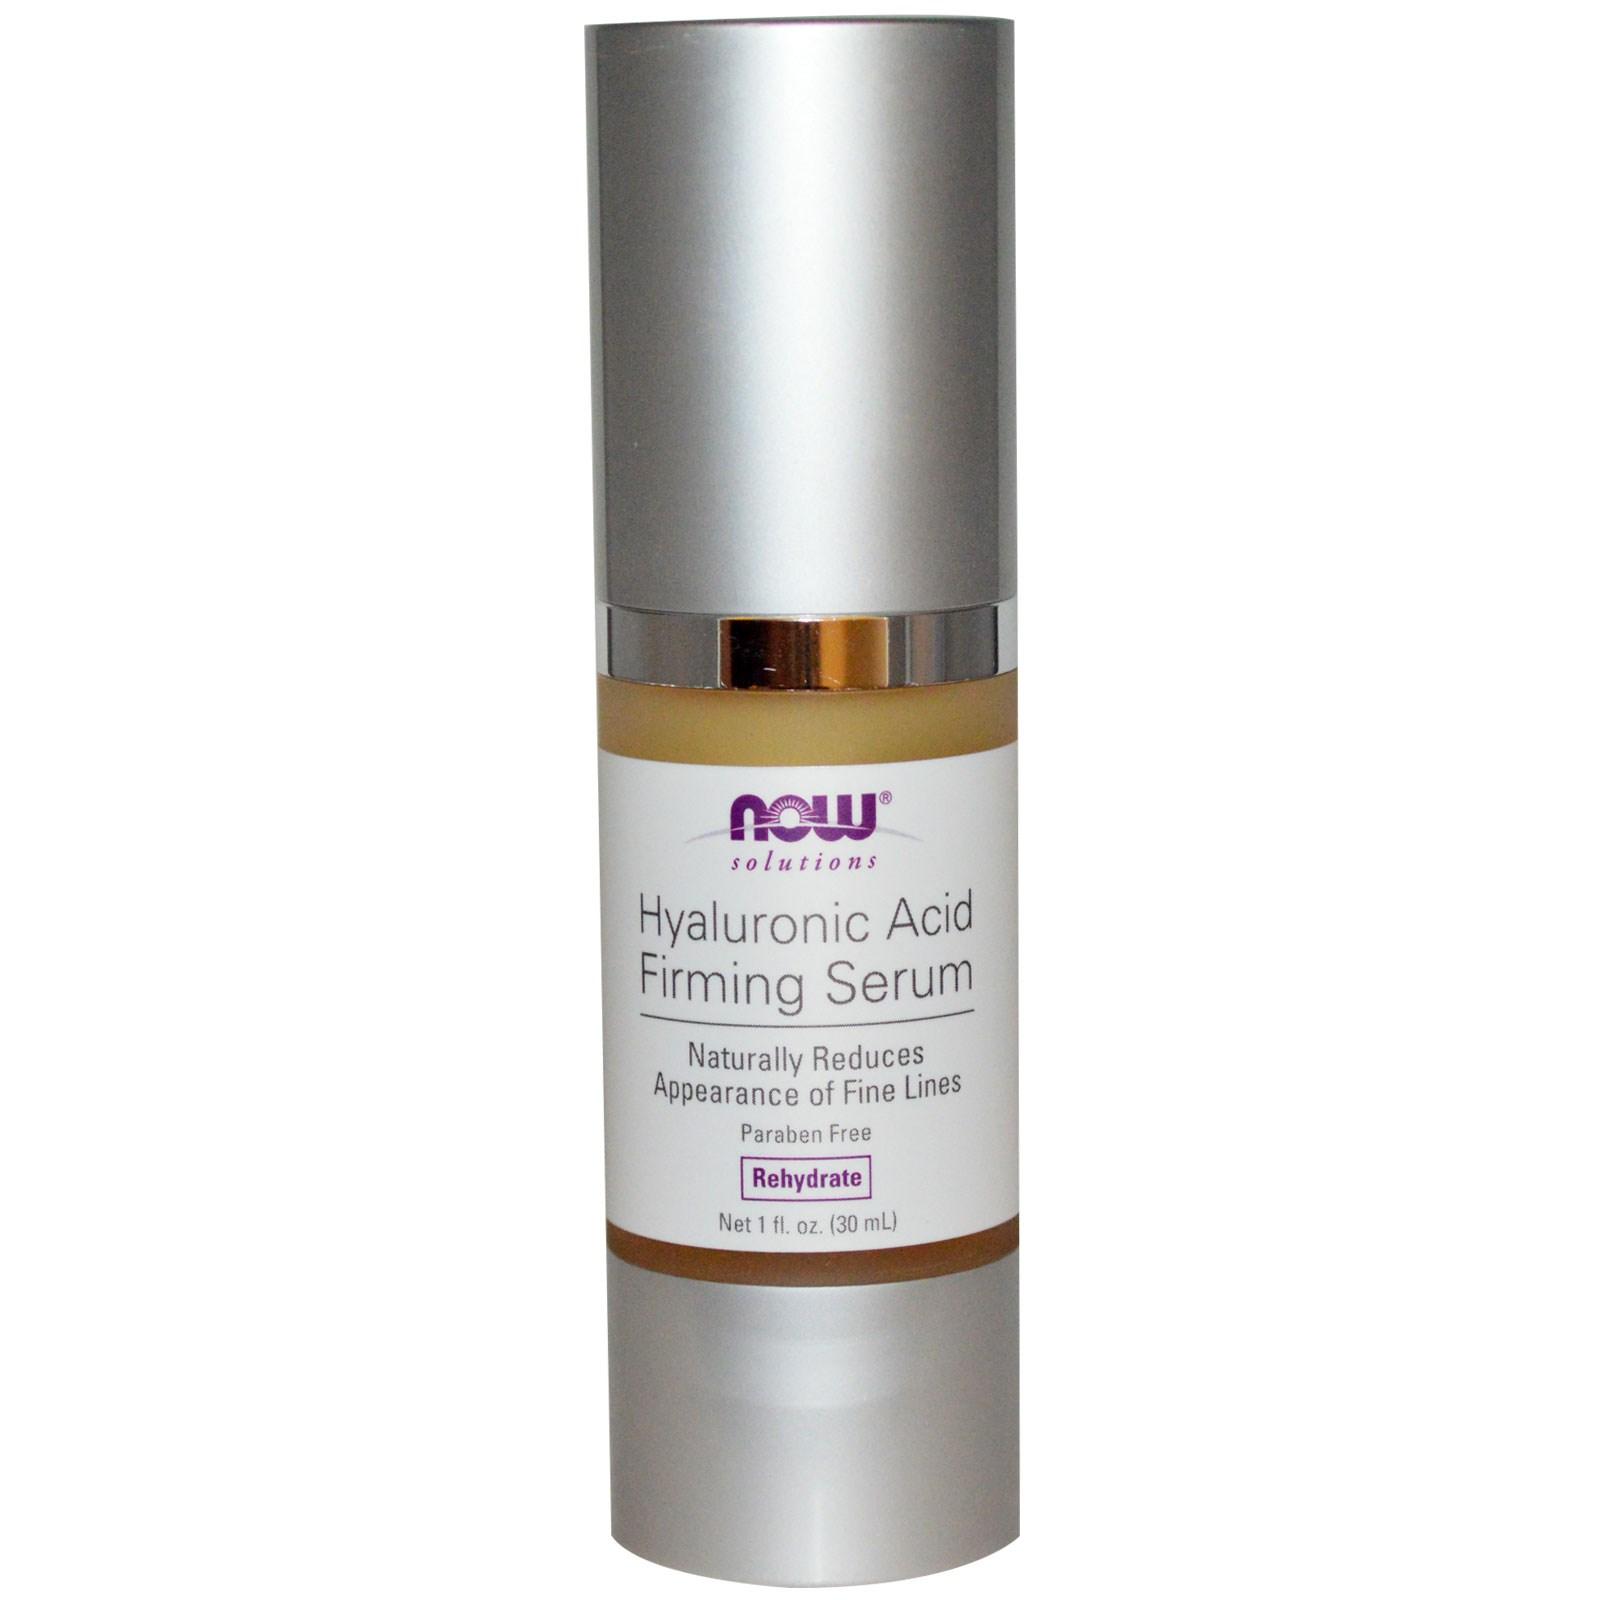 Image of Hyaluronic Acid Firming Serum (30 ml) - Now Foods 0733739077882